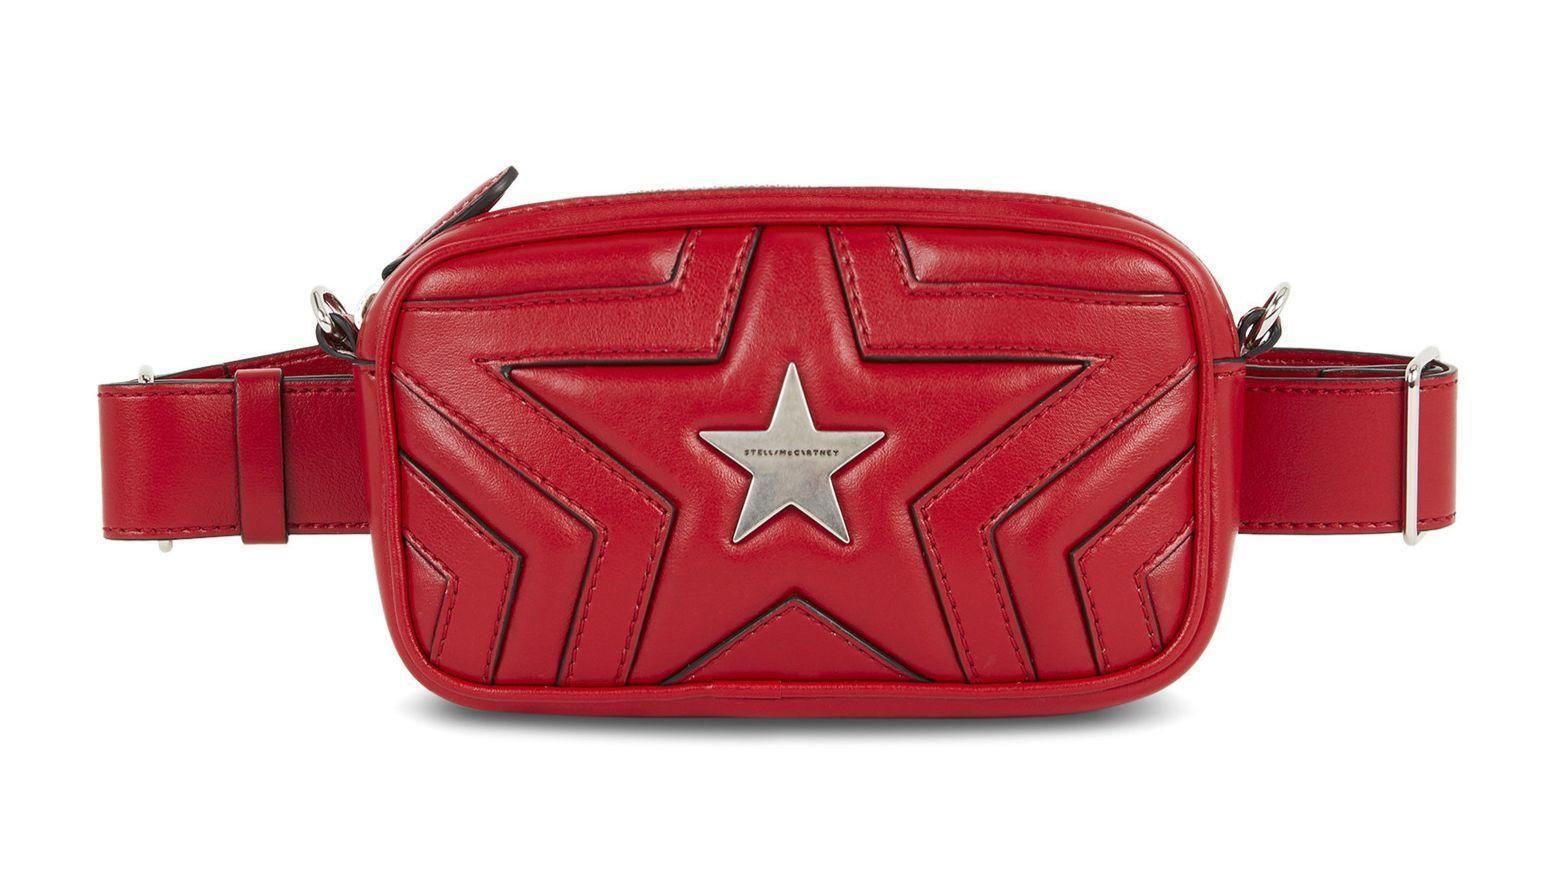 Stella McCartney's Stella Star Belt Bag.